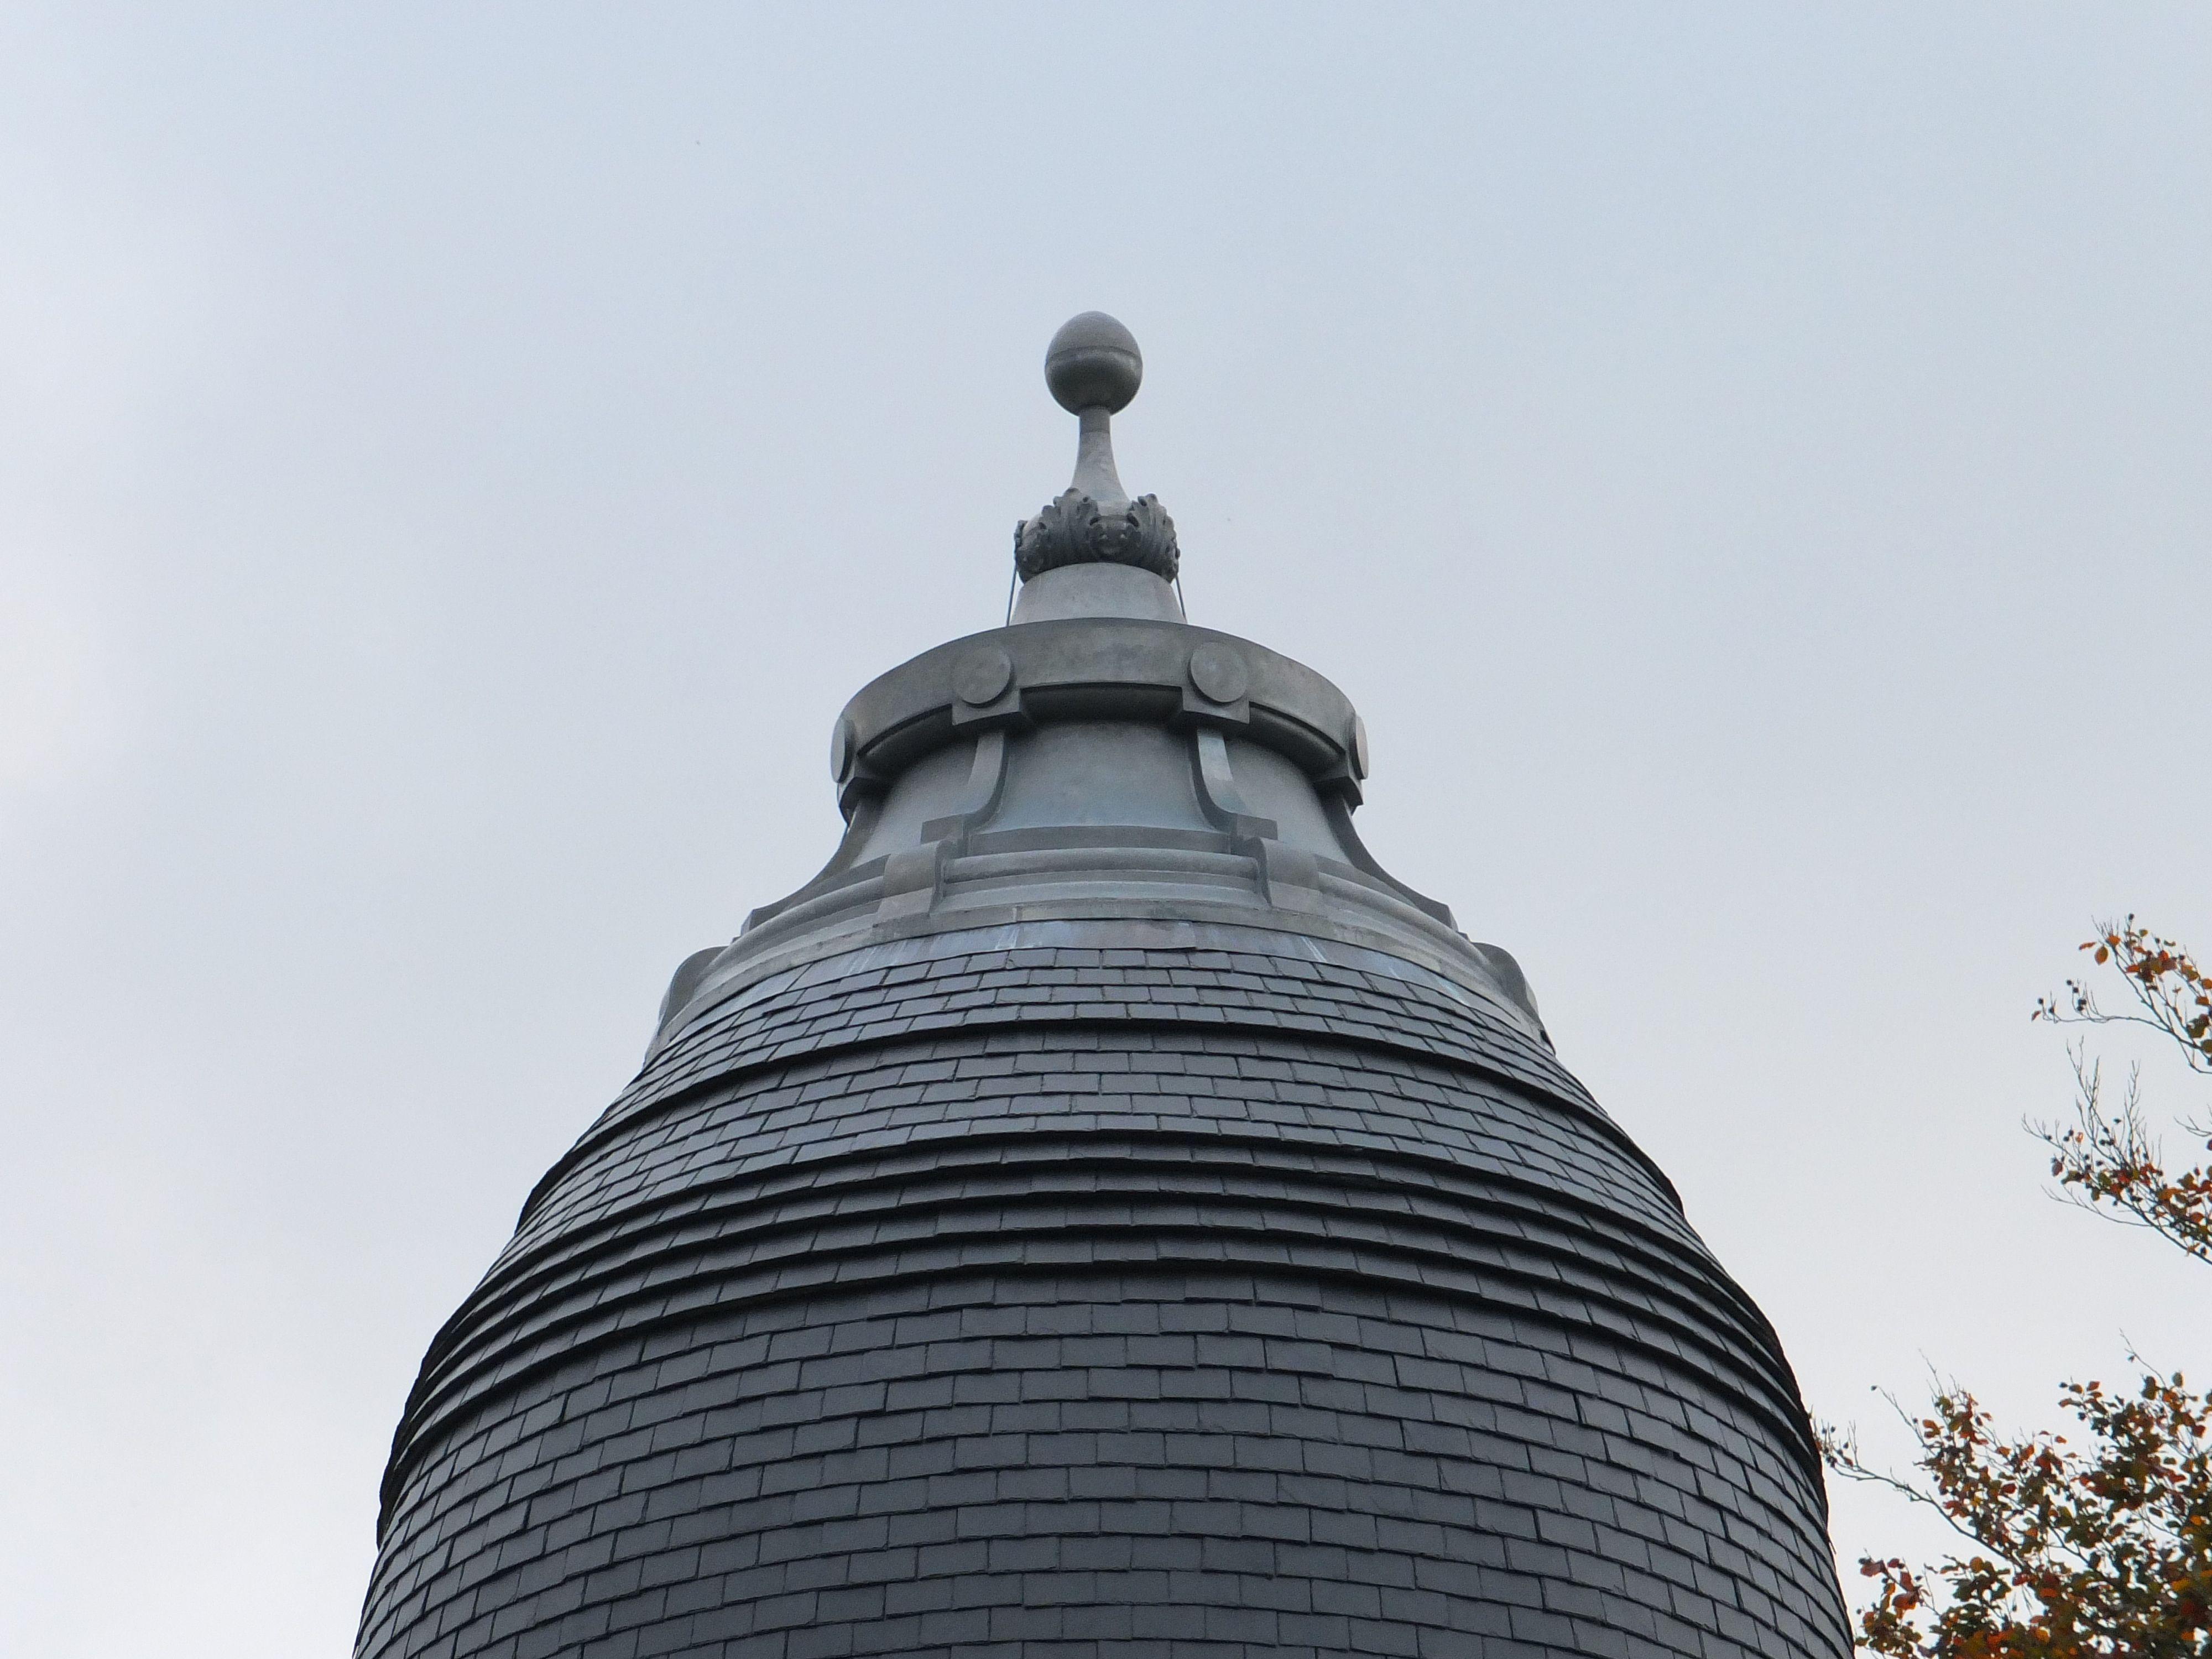 Zinc Dome Belgium Zinc Vmzinc Belgique Belgium Roofing Metal Ornament Dome Lamp Post